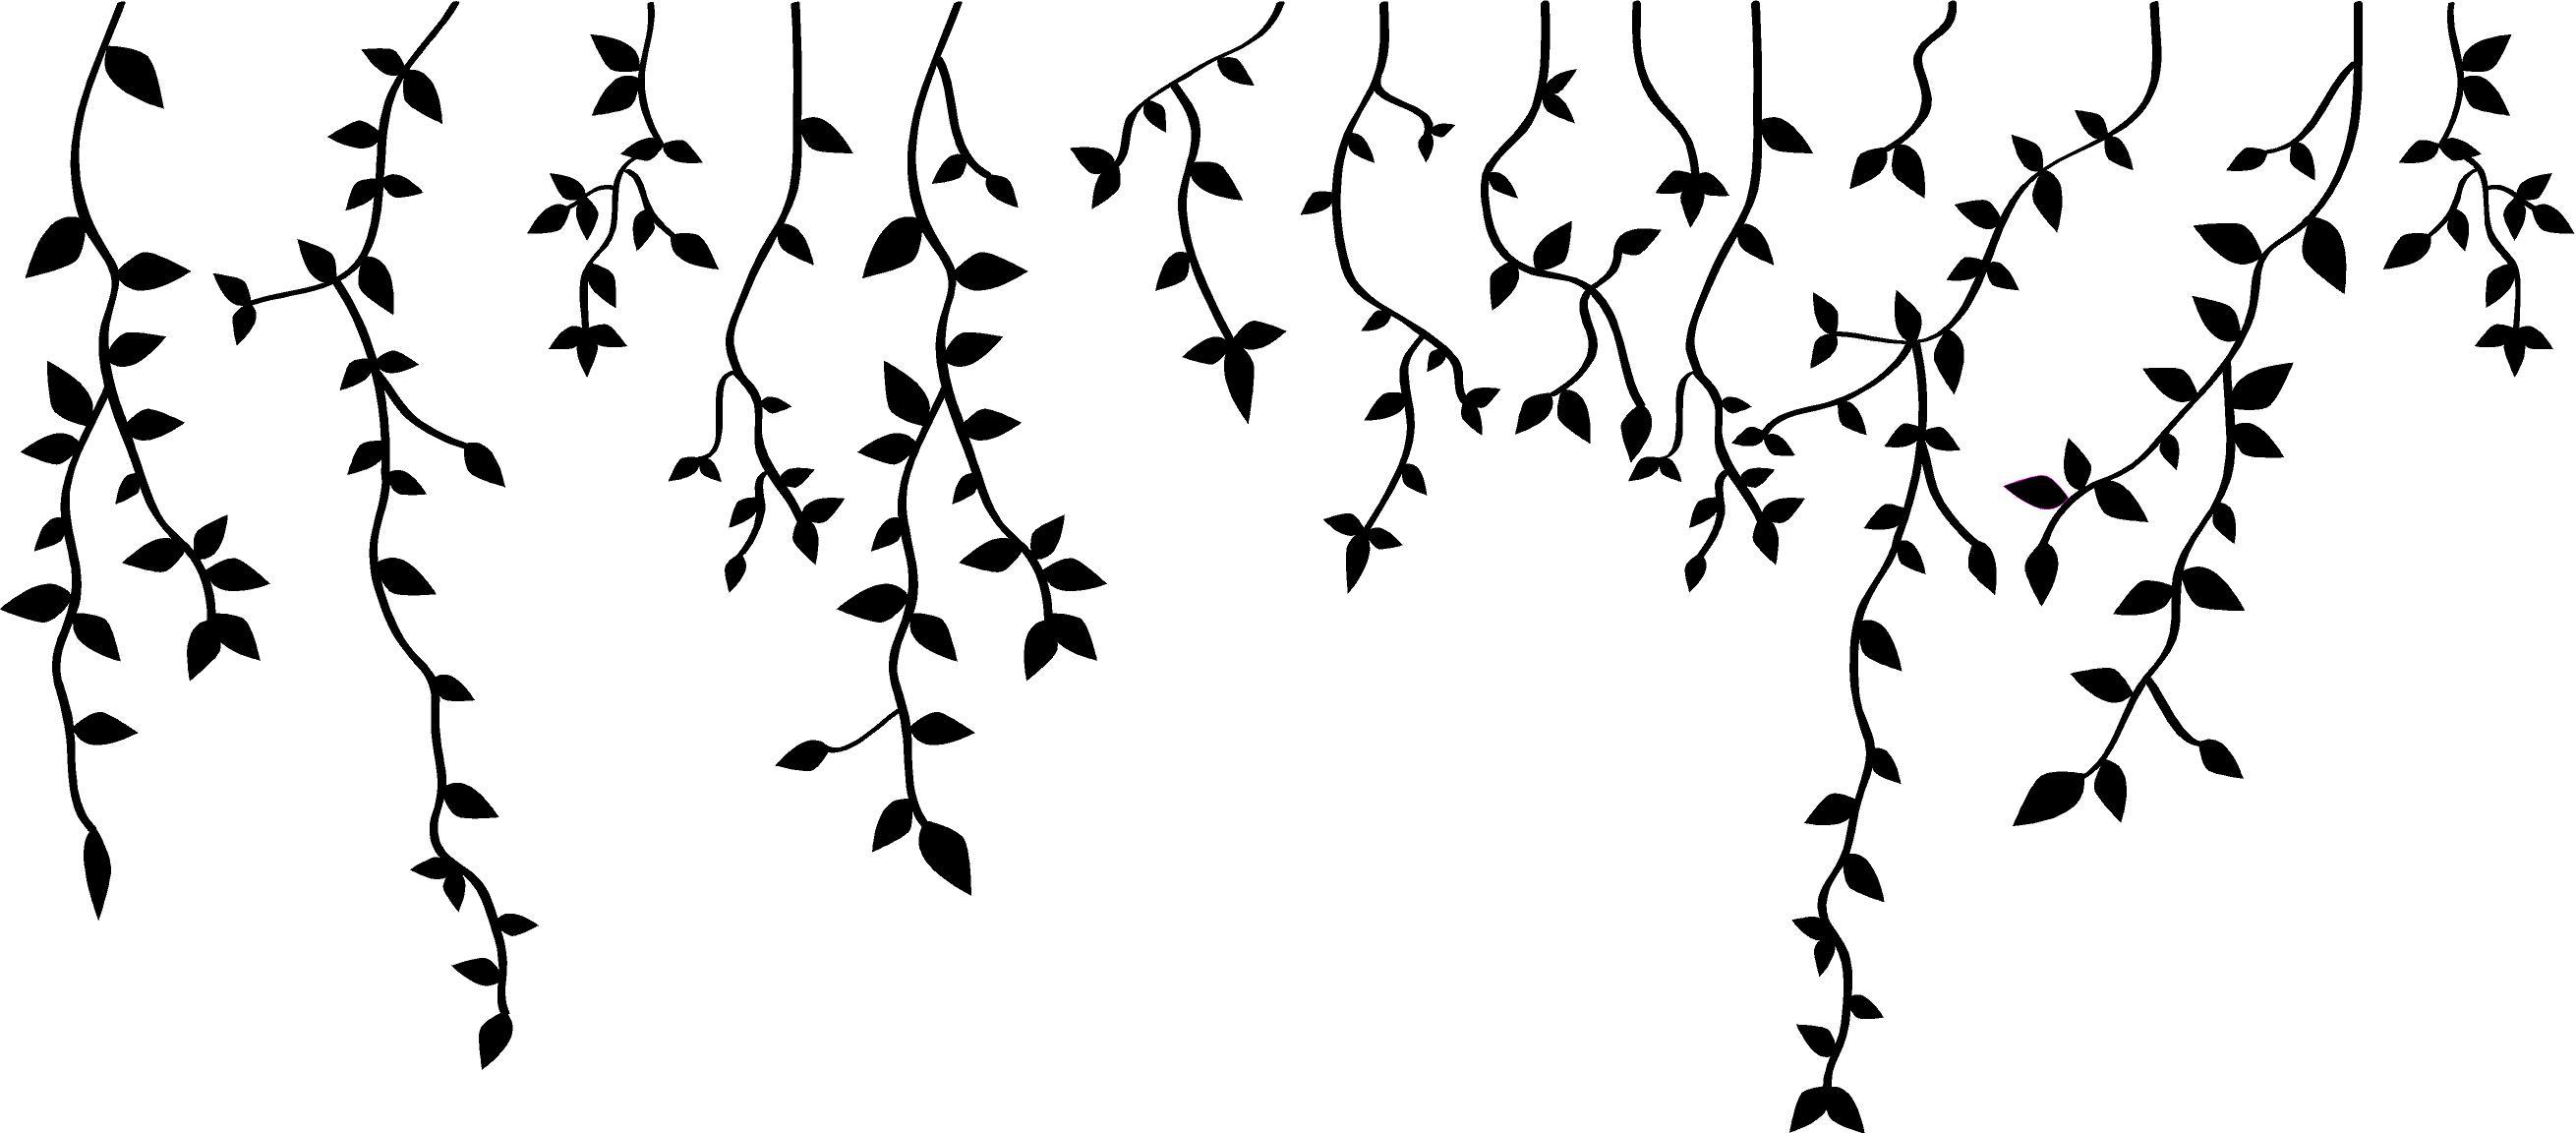 Hanging vines clipart clip art download Hanging Vines Vinyl Decor clip art download